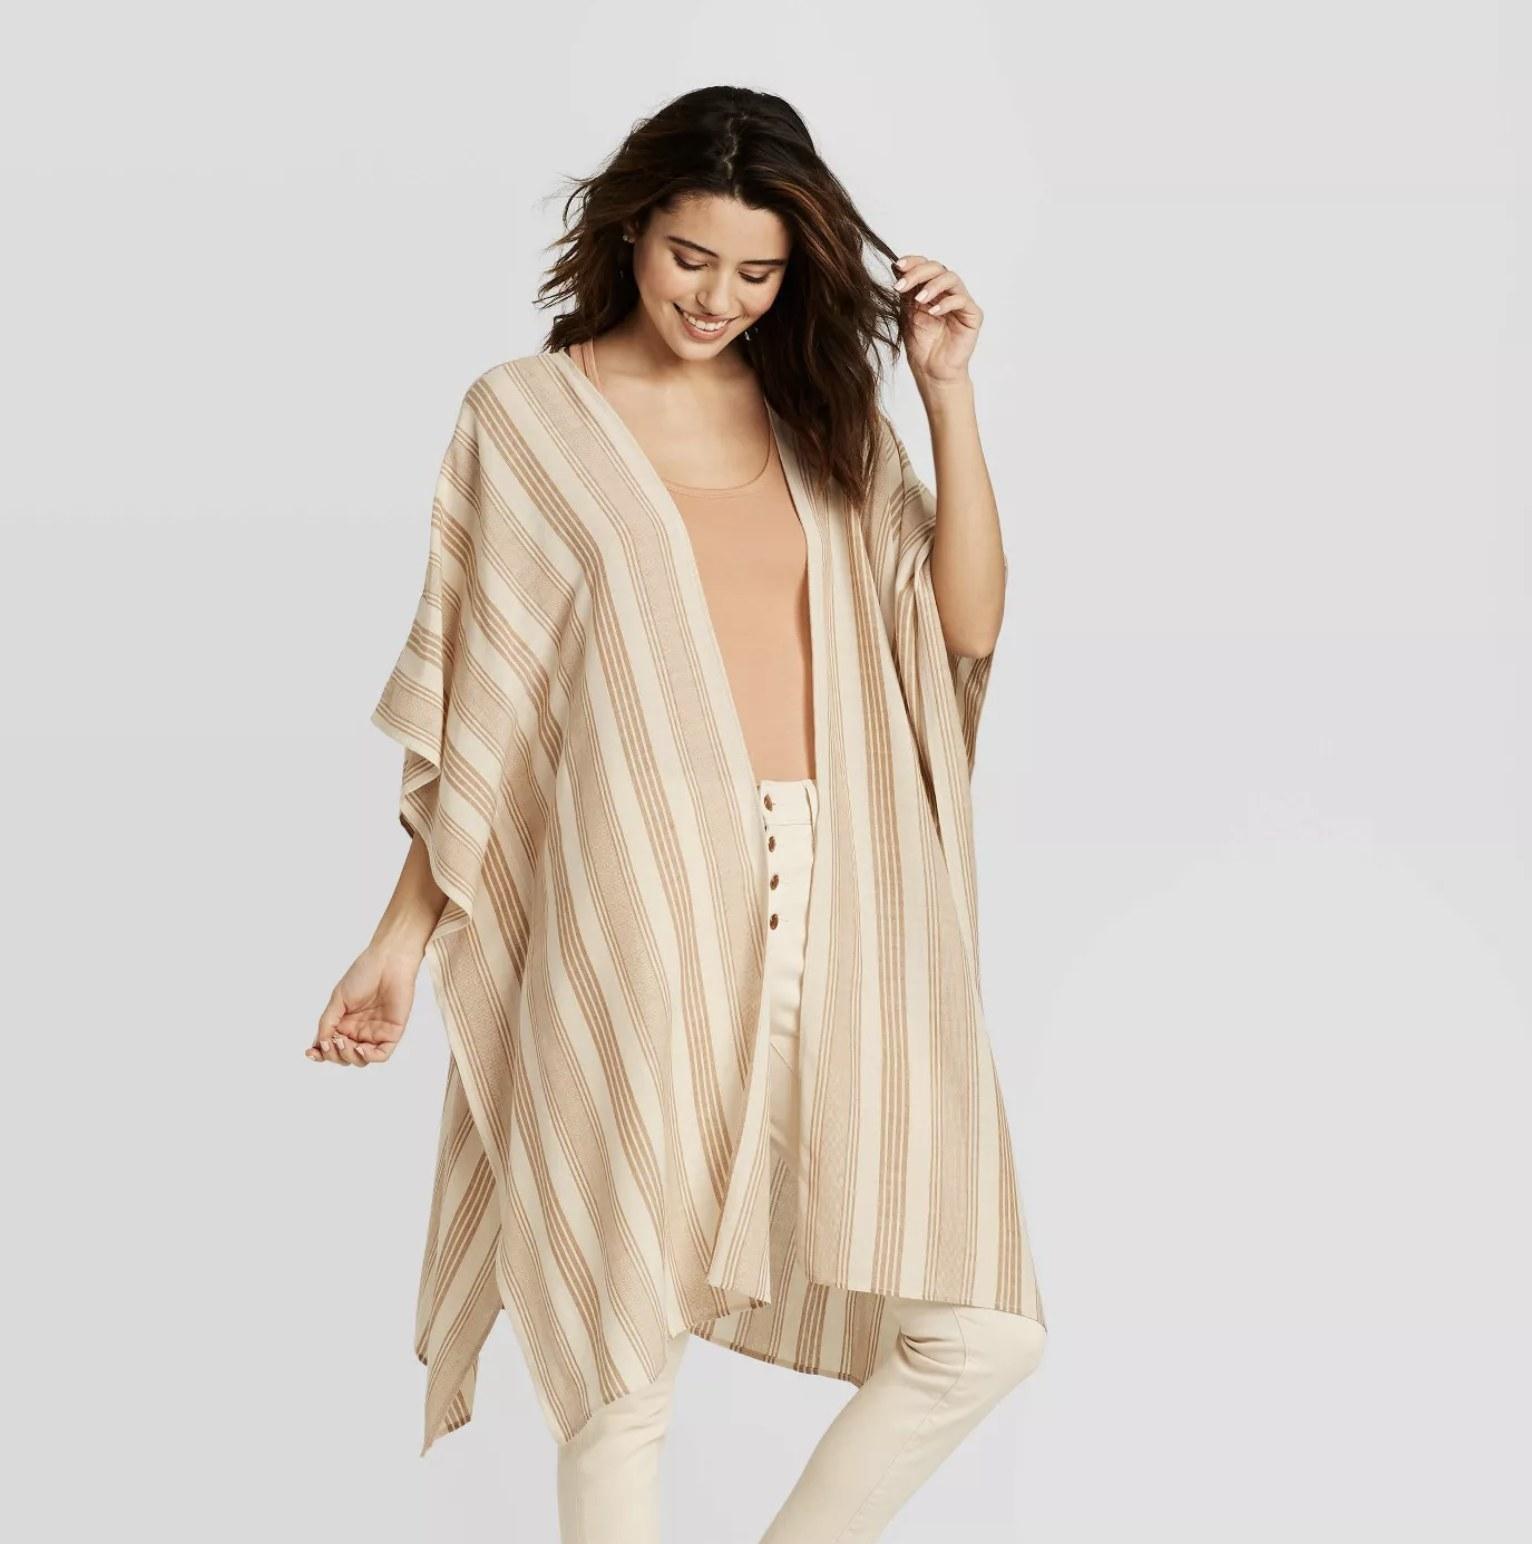 model wearing midi length striped kimono